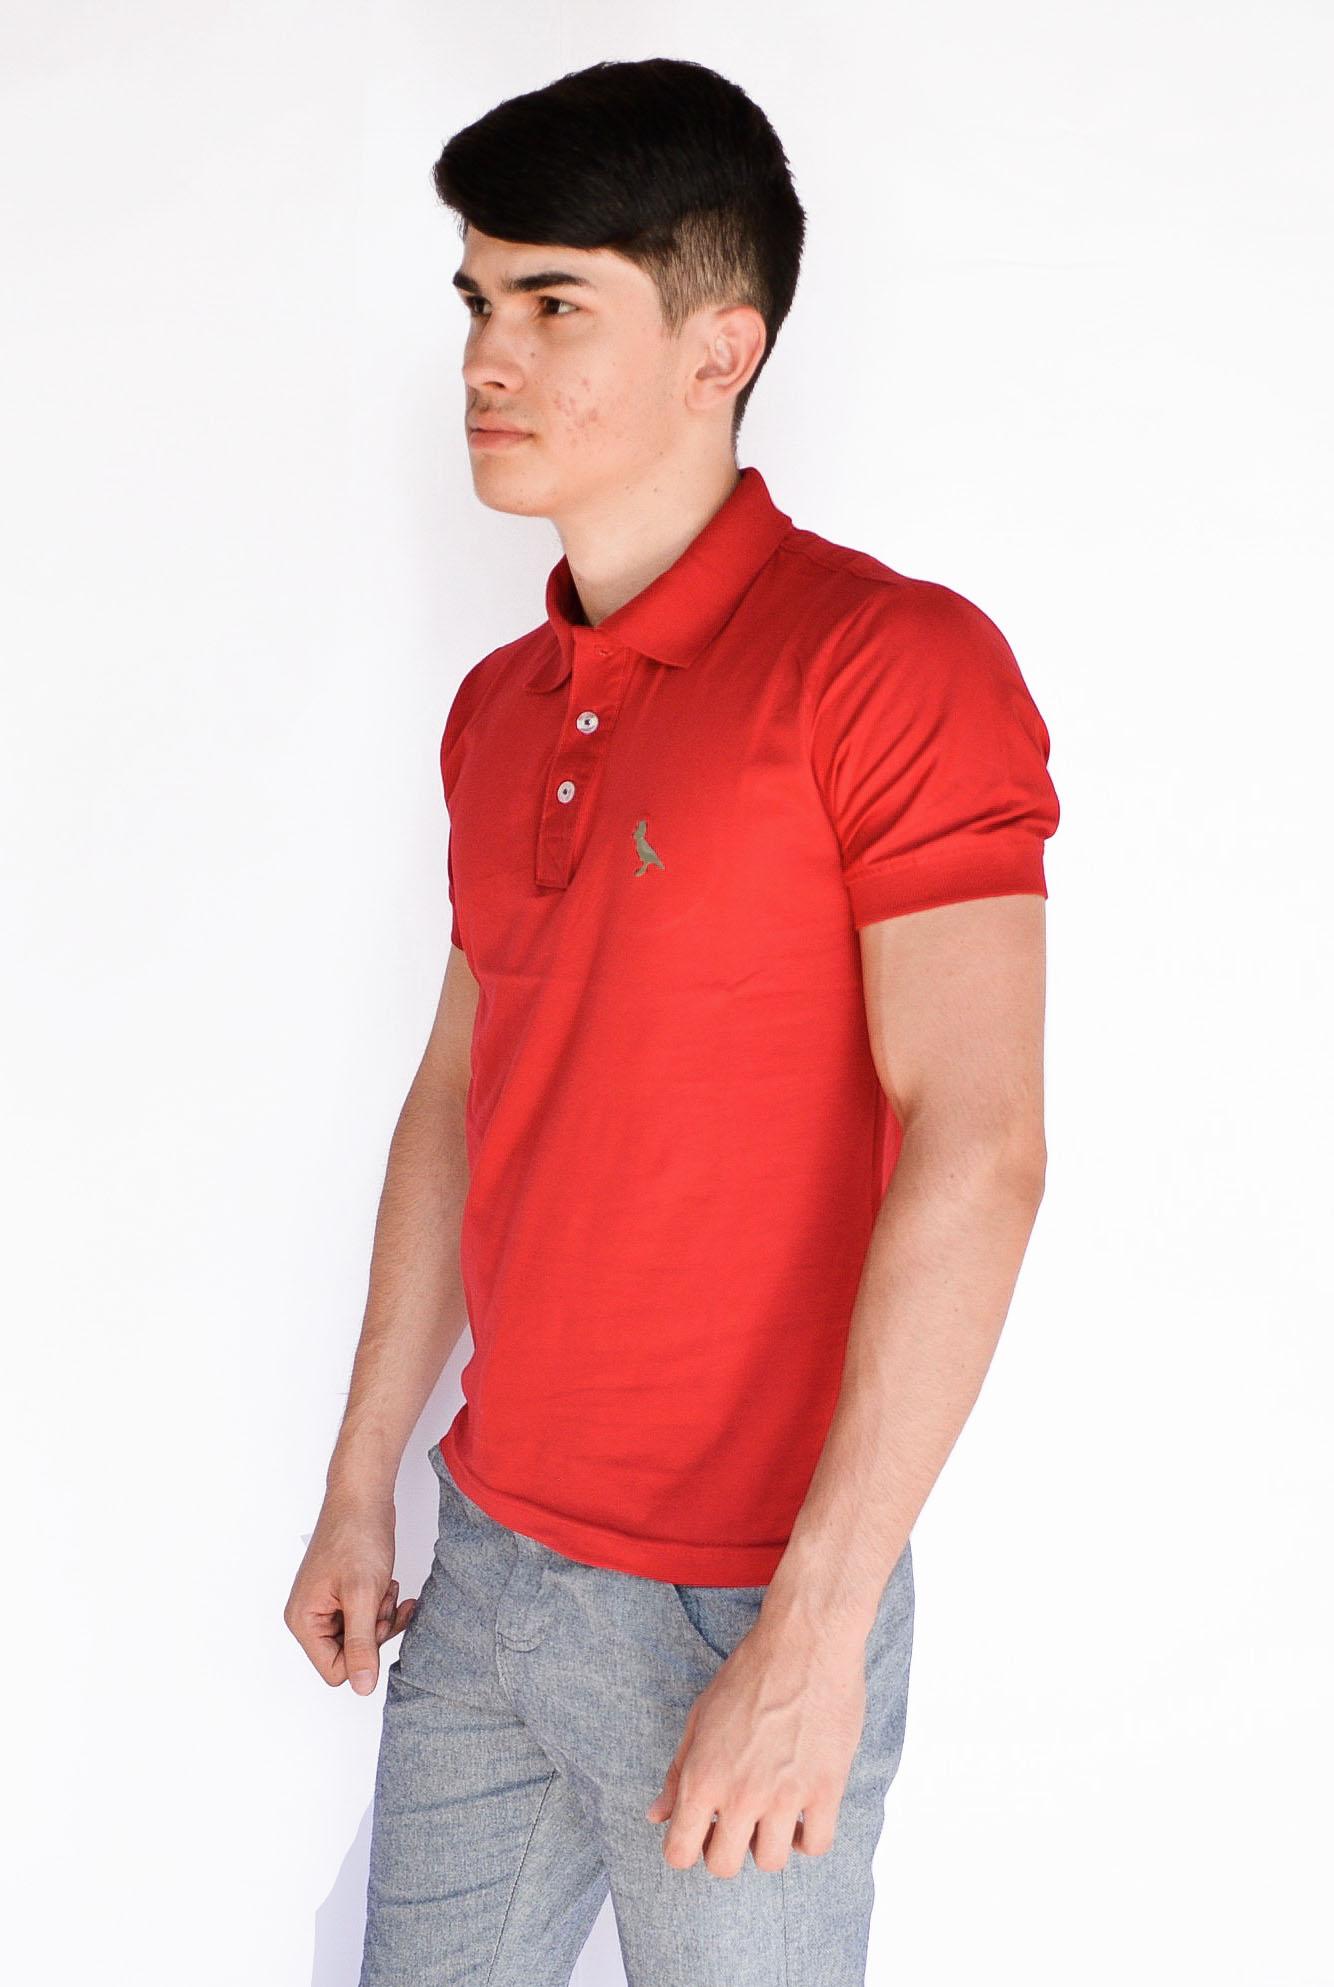 Camisa Polo Básica  Vermelho  - Kactoos